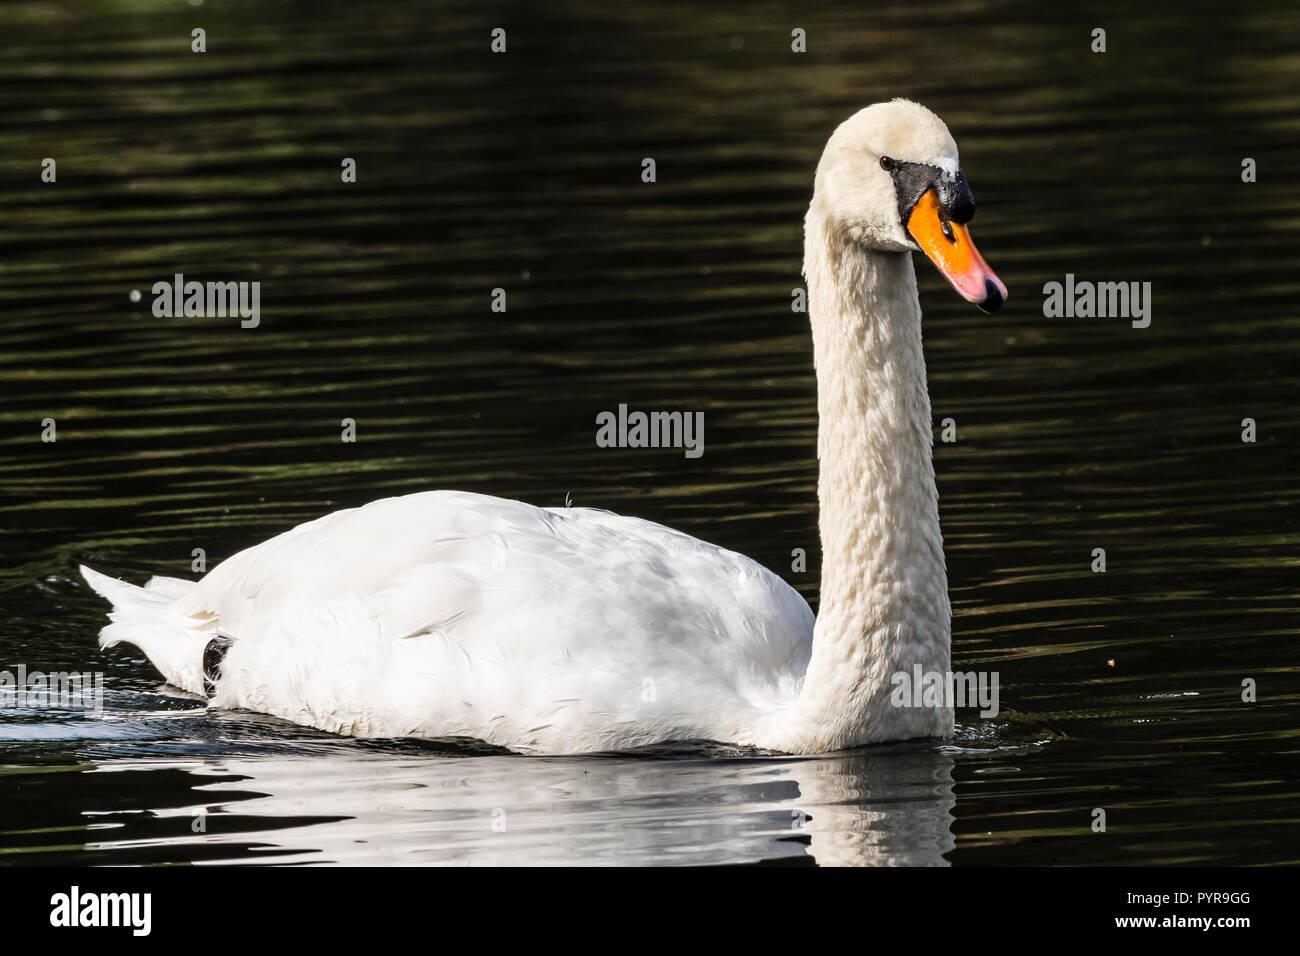 White swan on the lake at The Vyne, Hampshire, UK - Stock Image